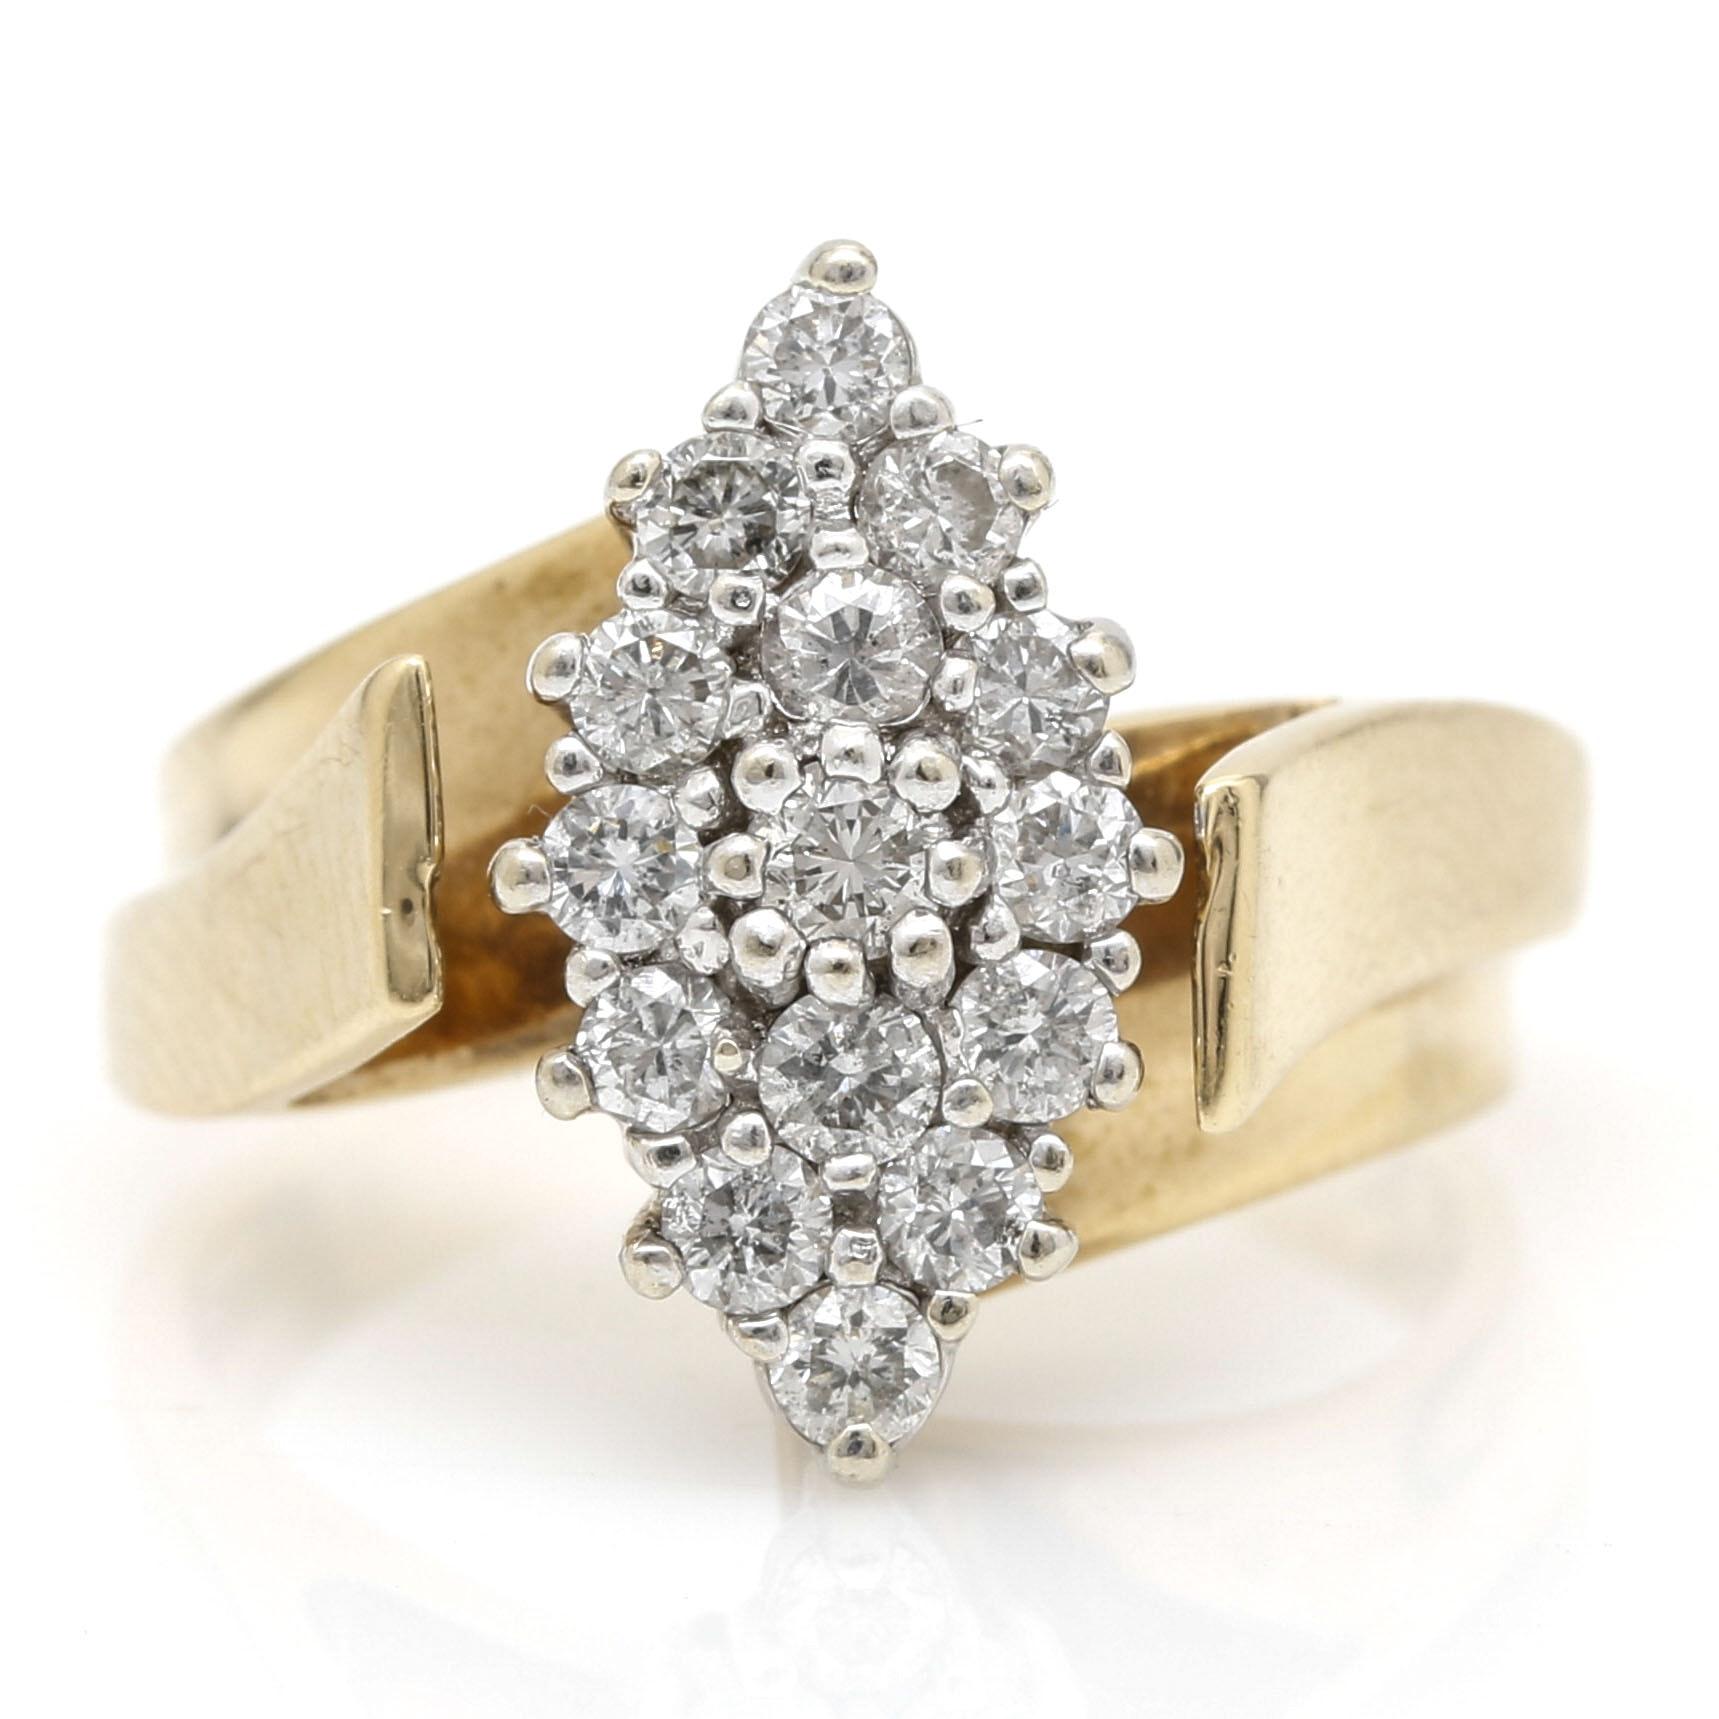 14K Two Tone  Yellow Gold Diamond Ring